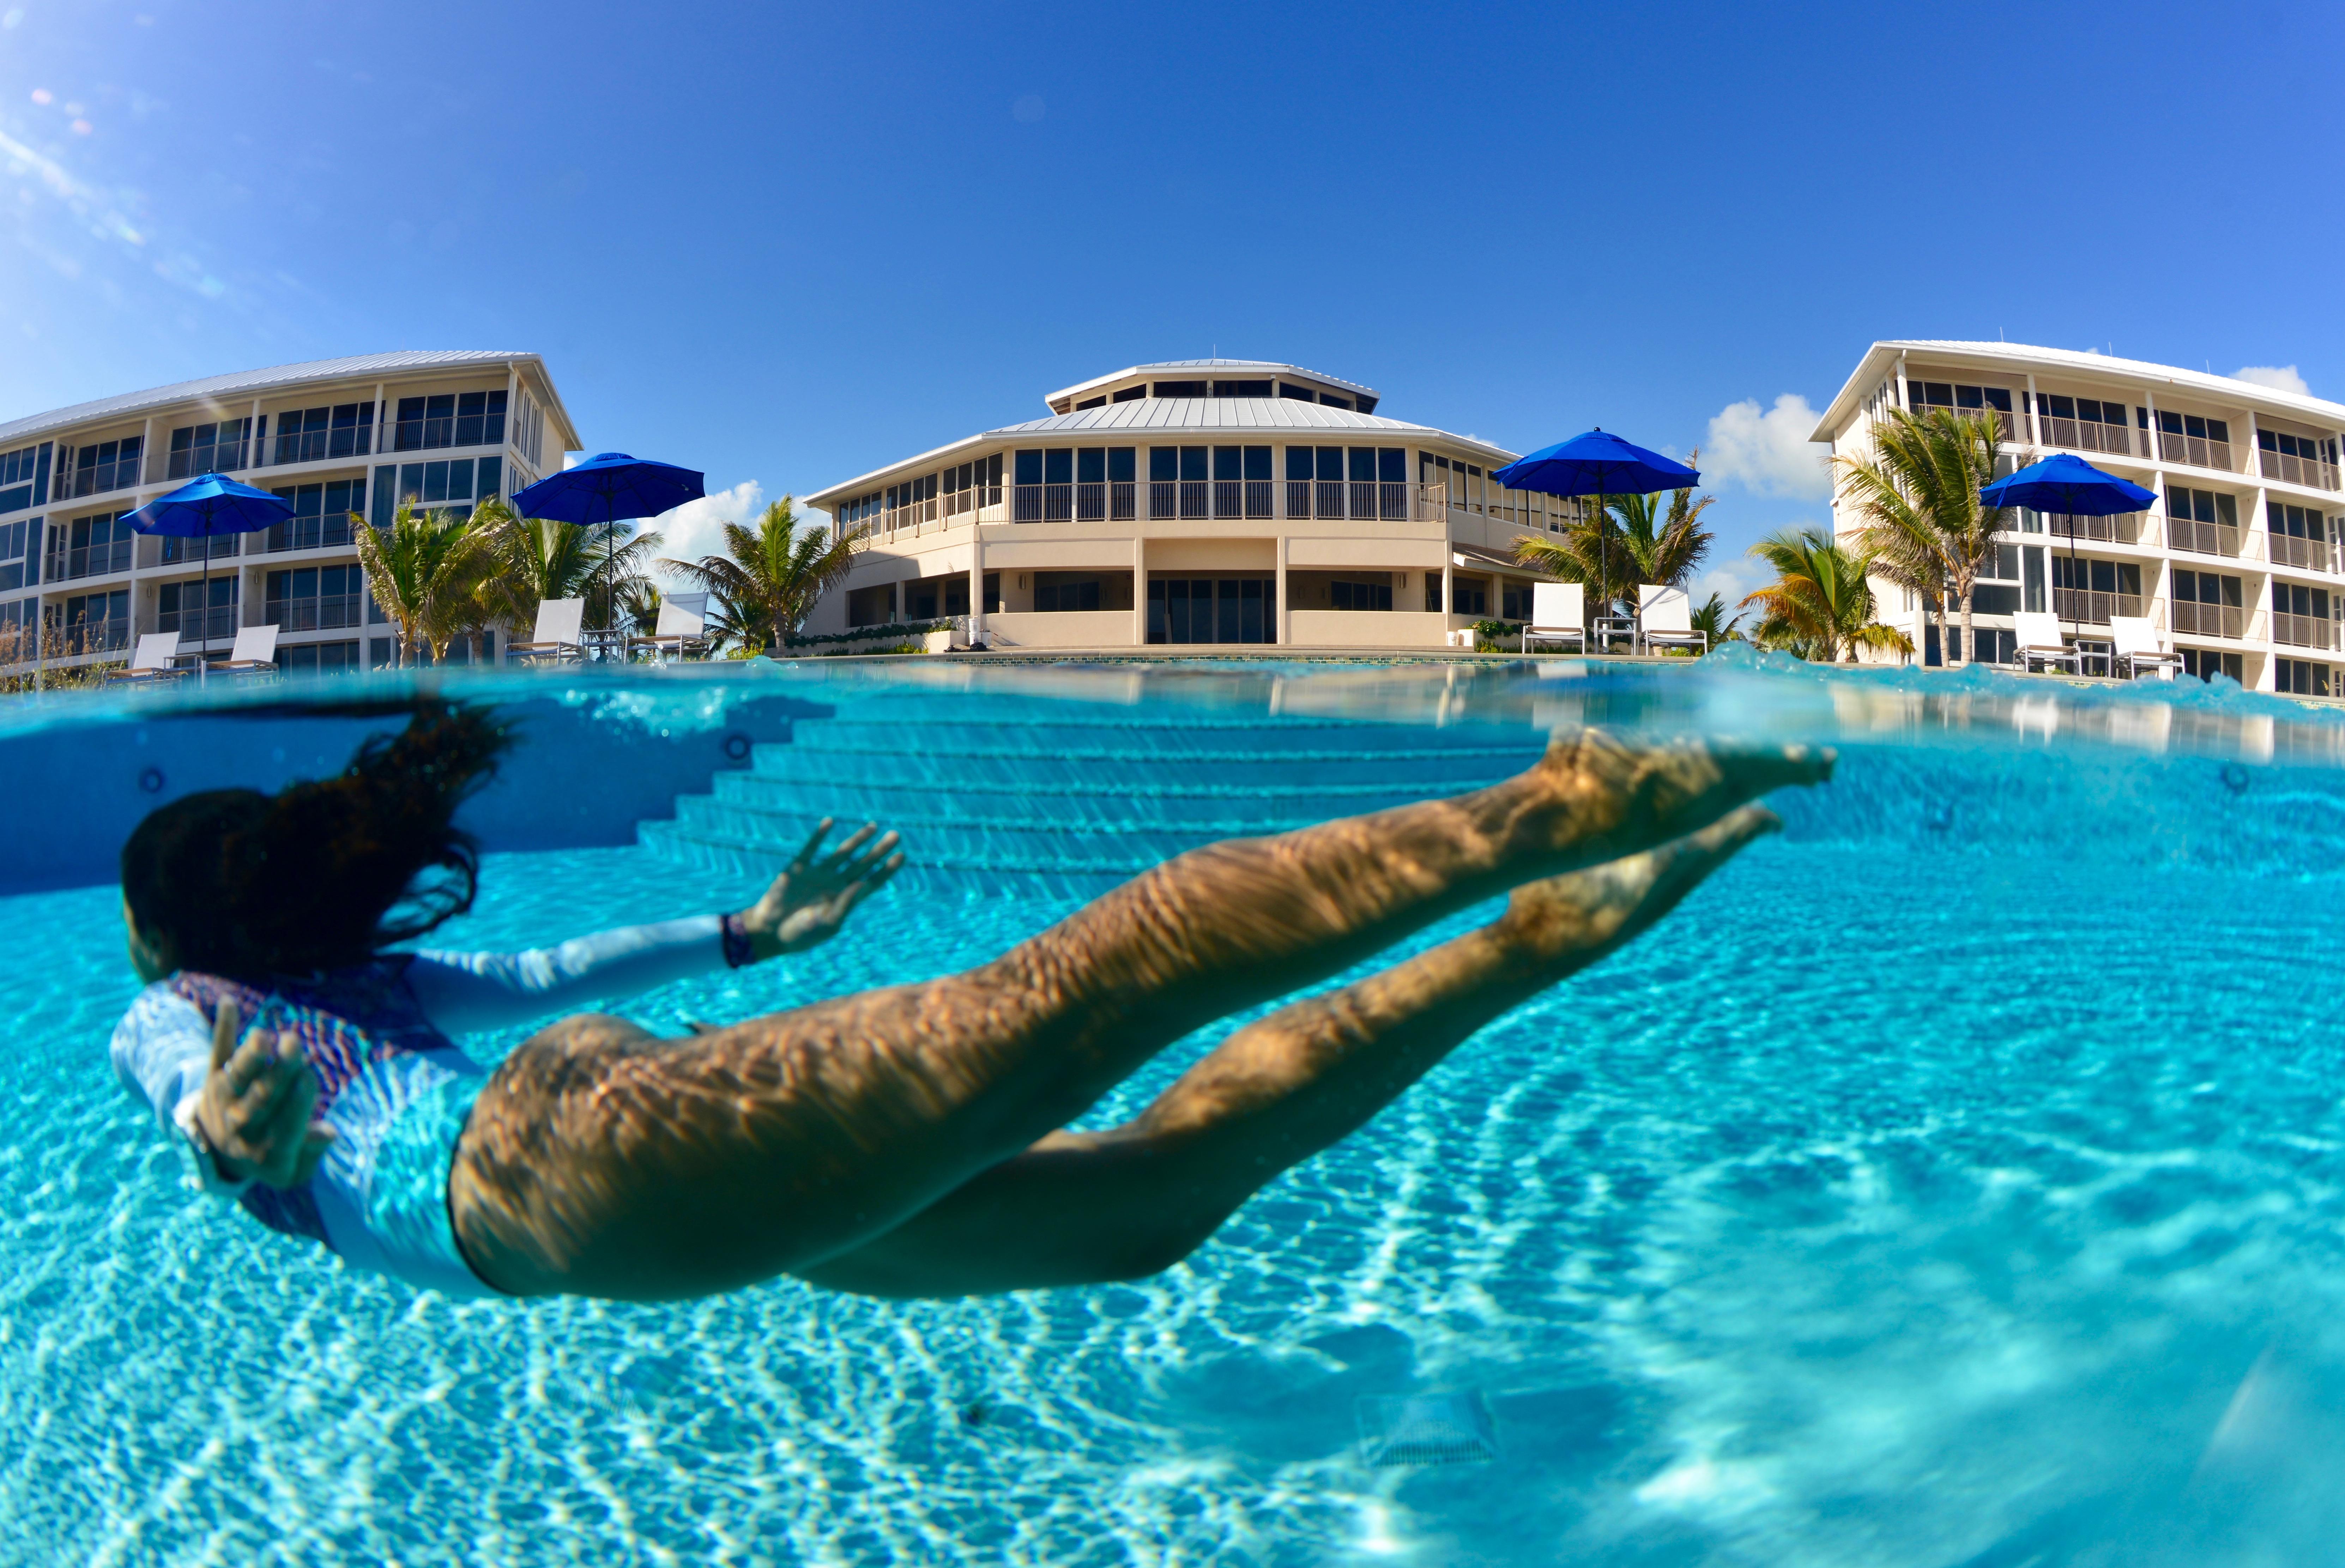 Swimming at the Pool at East Bay Resort South Caicos